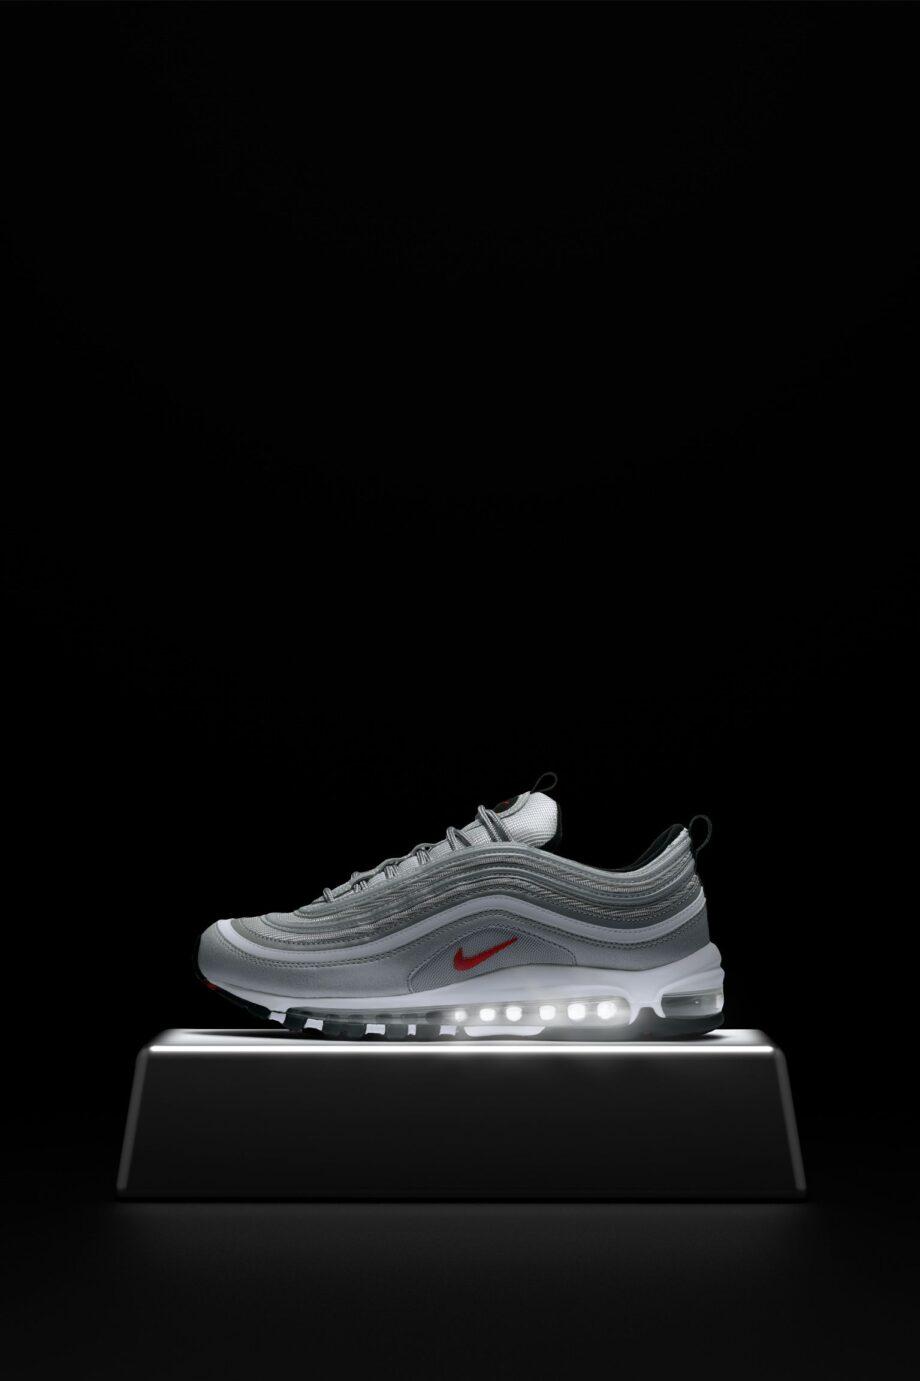 nike-air-max-97-og-metallic-silver-884421-001